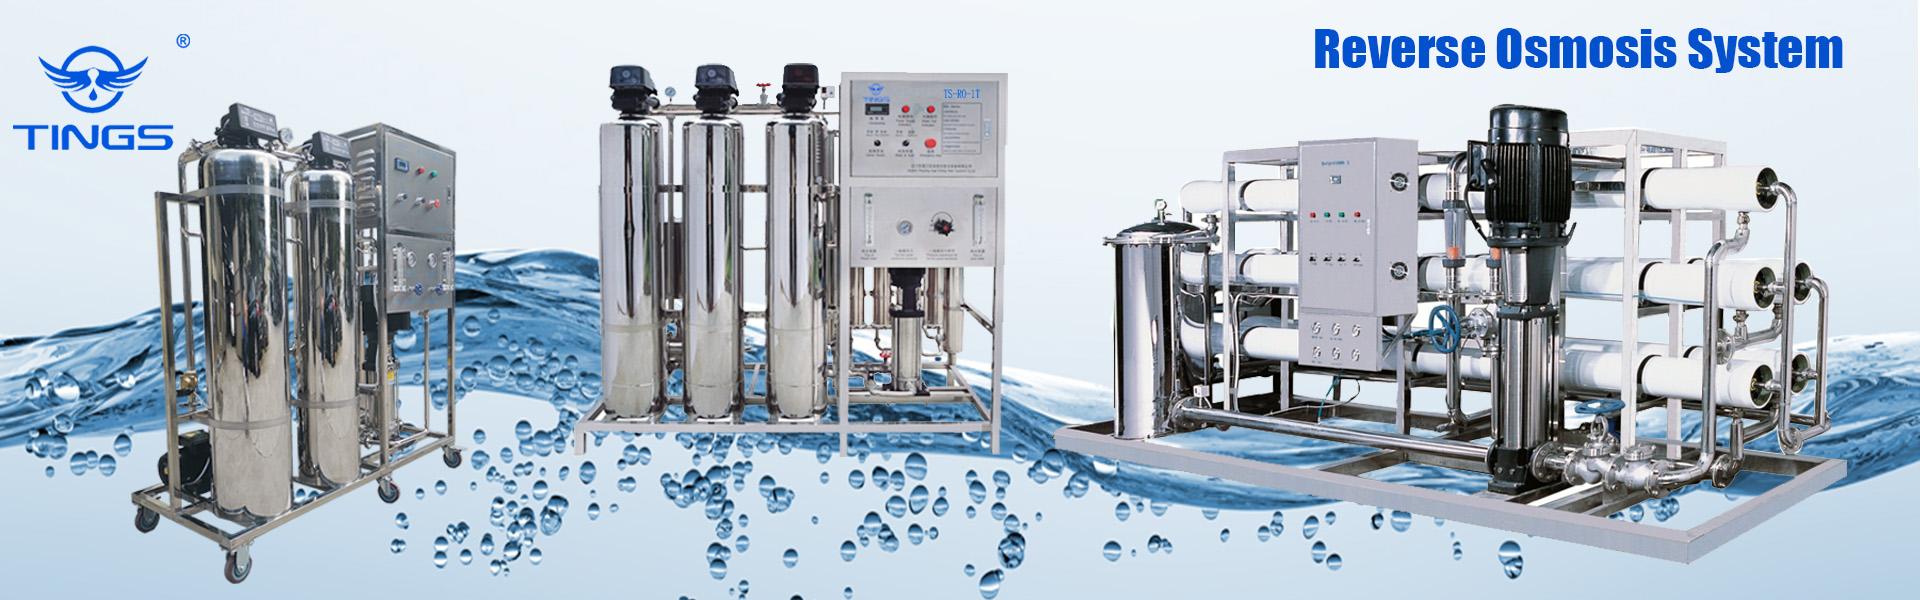 03 Reverse Osmosis System